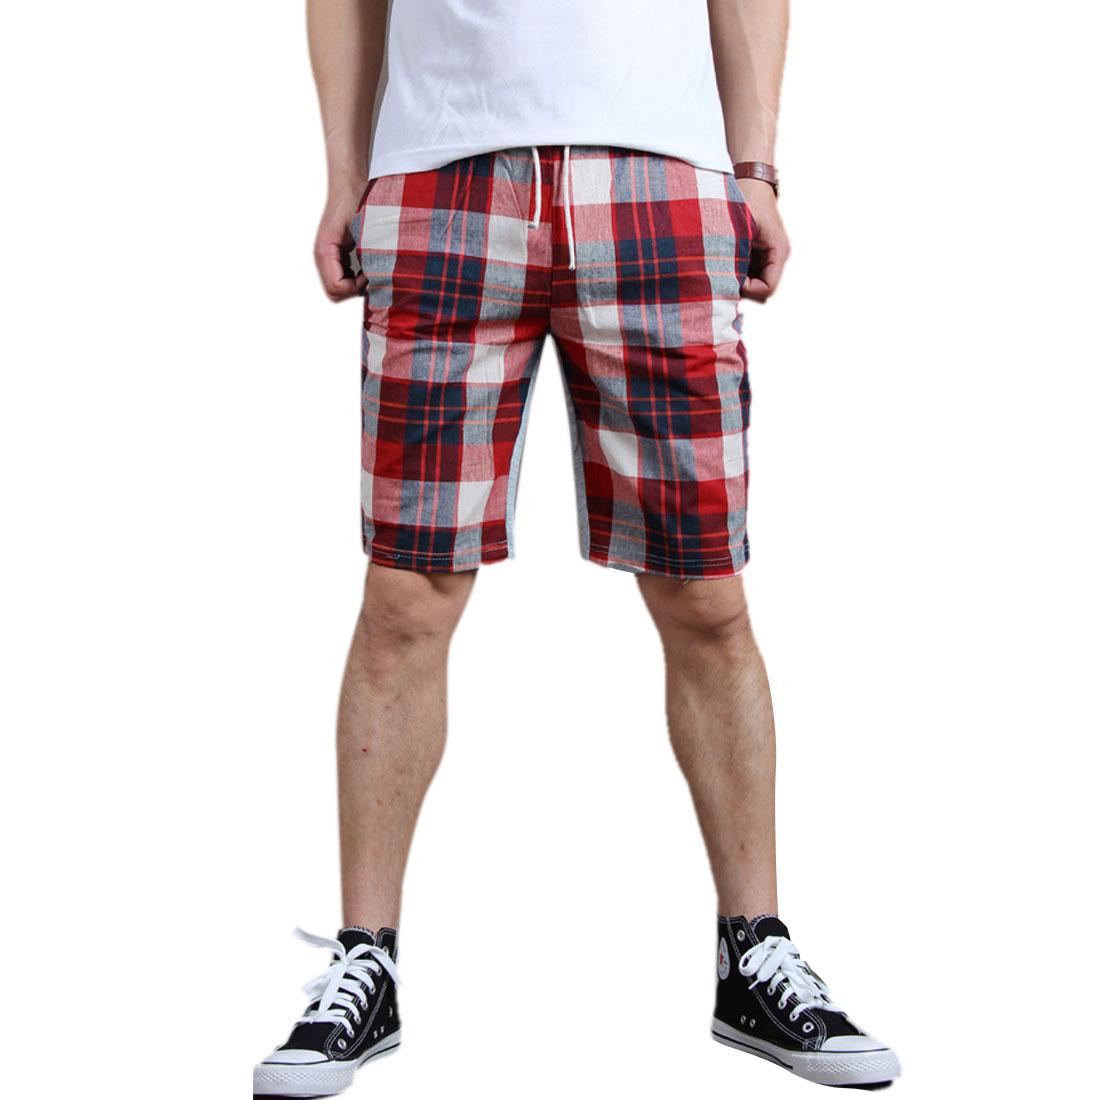 Men Draw Coar Waist Plaids Pattern Splice Red Light Gray Beach Shorts W28